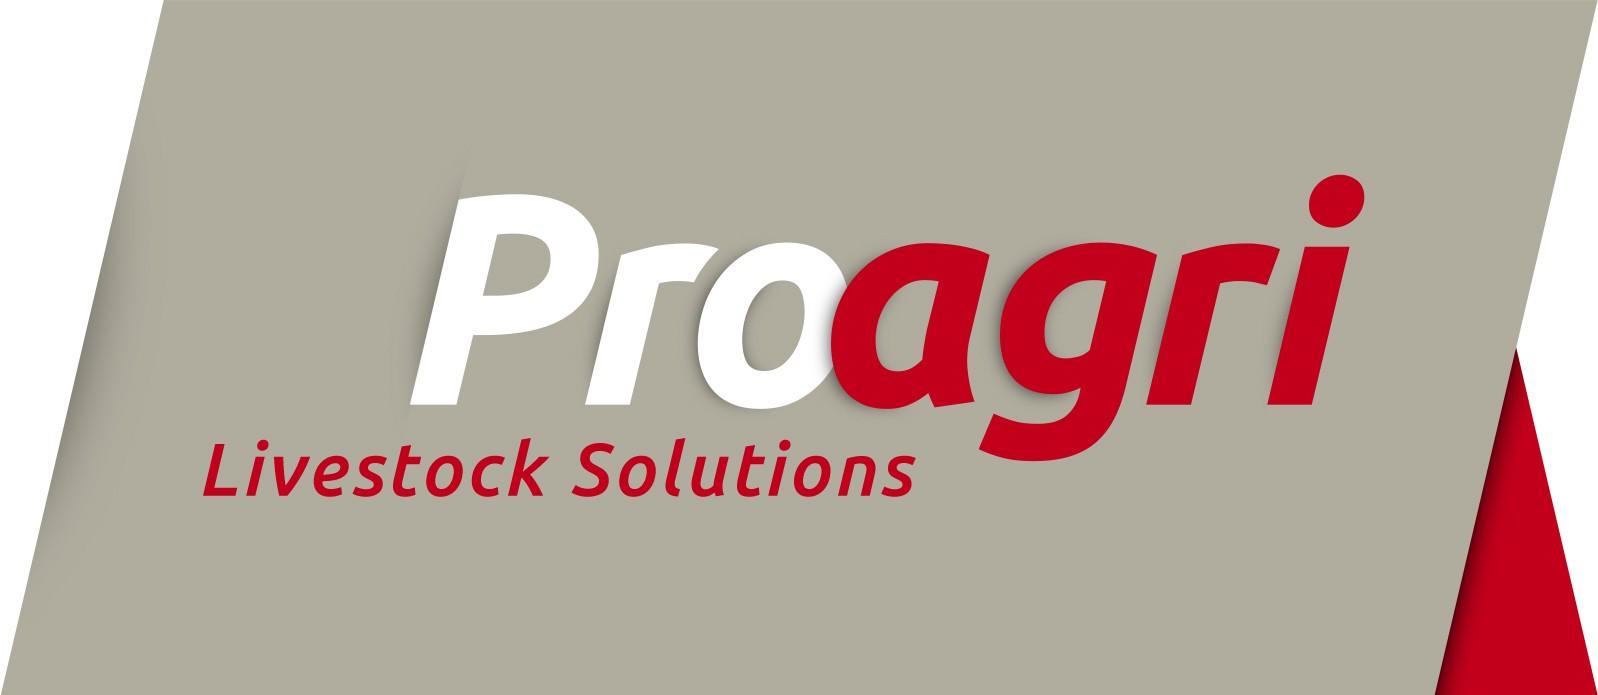 https://www.twobrands.nl/wp-content/uploads/Proagri_logo_extra_large-1.jpg